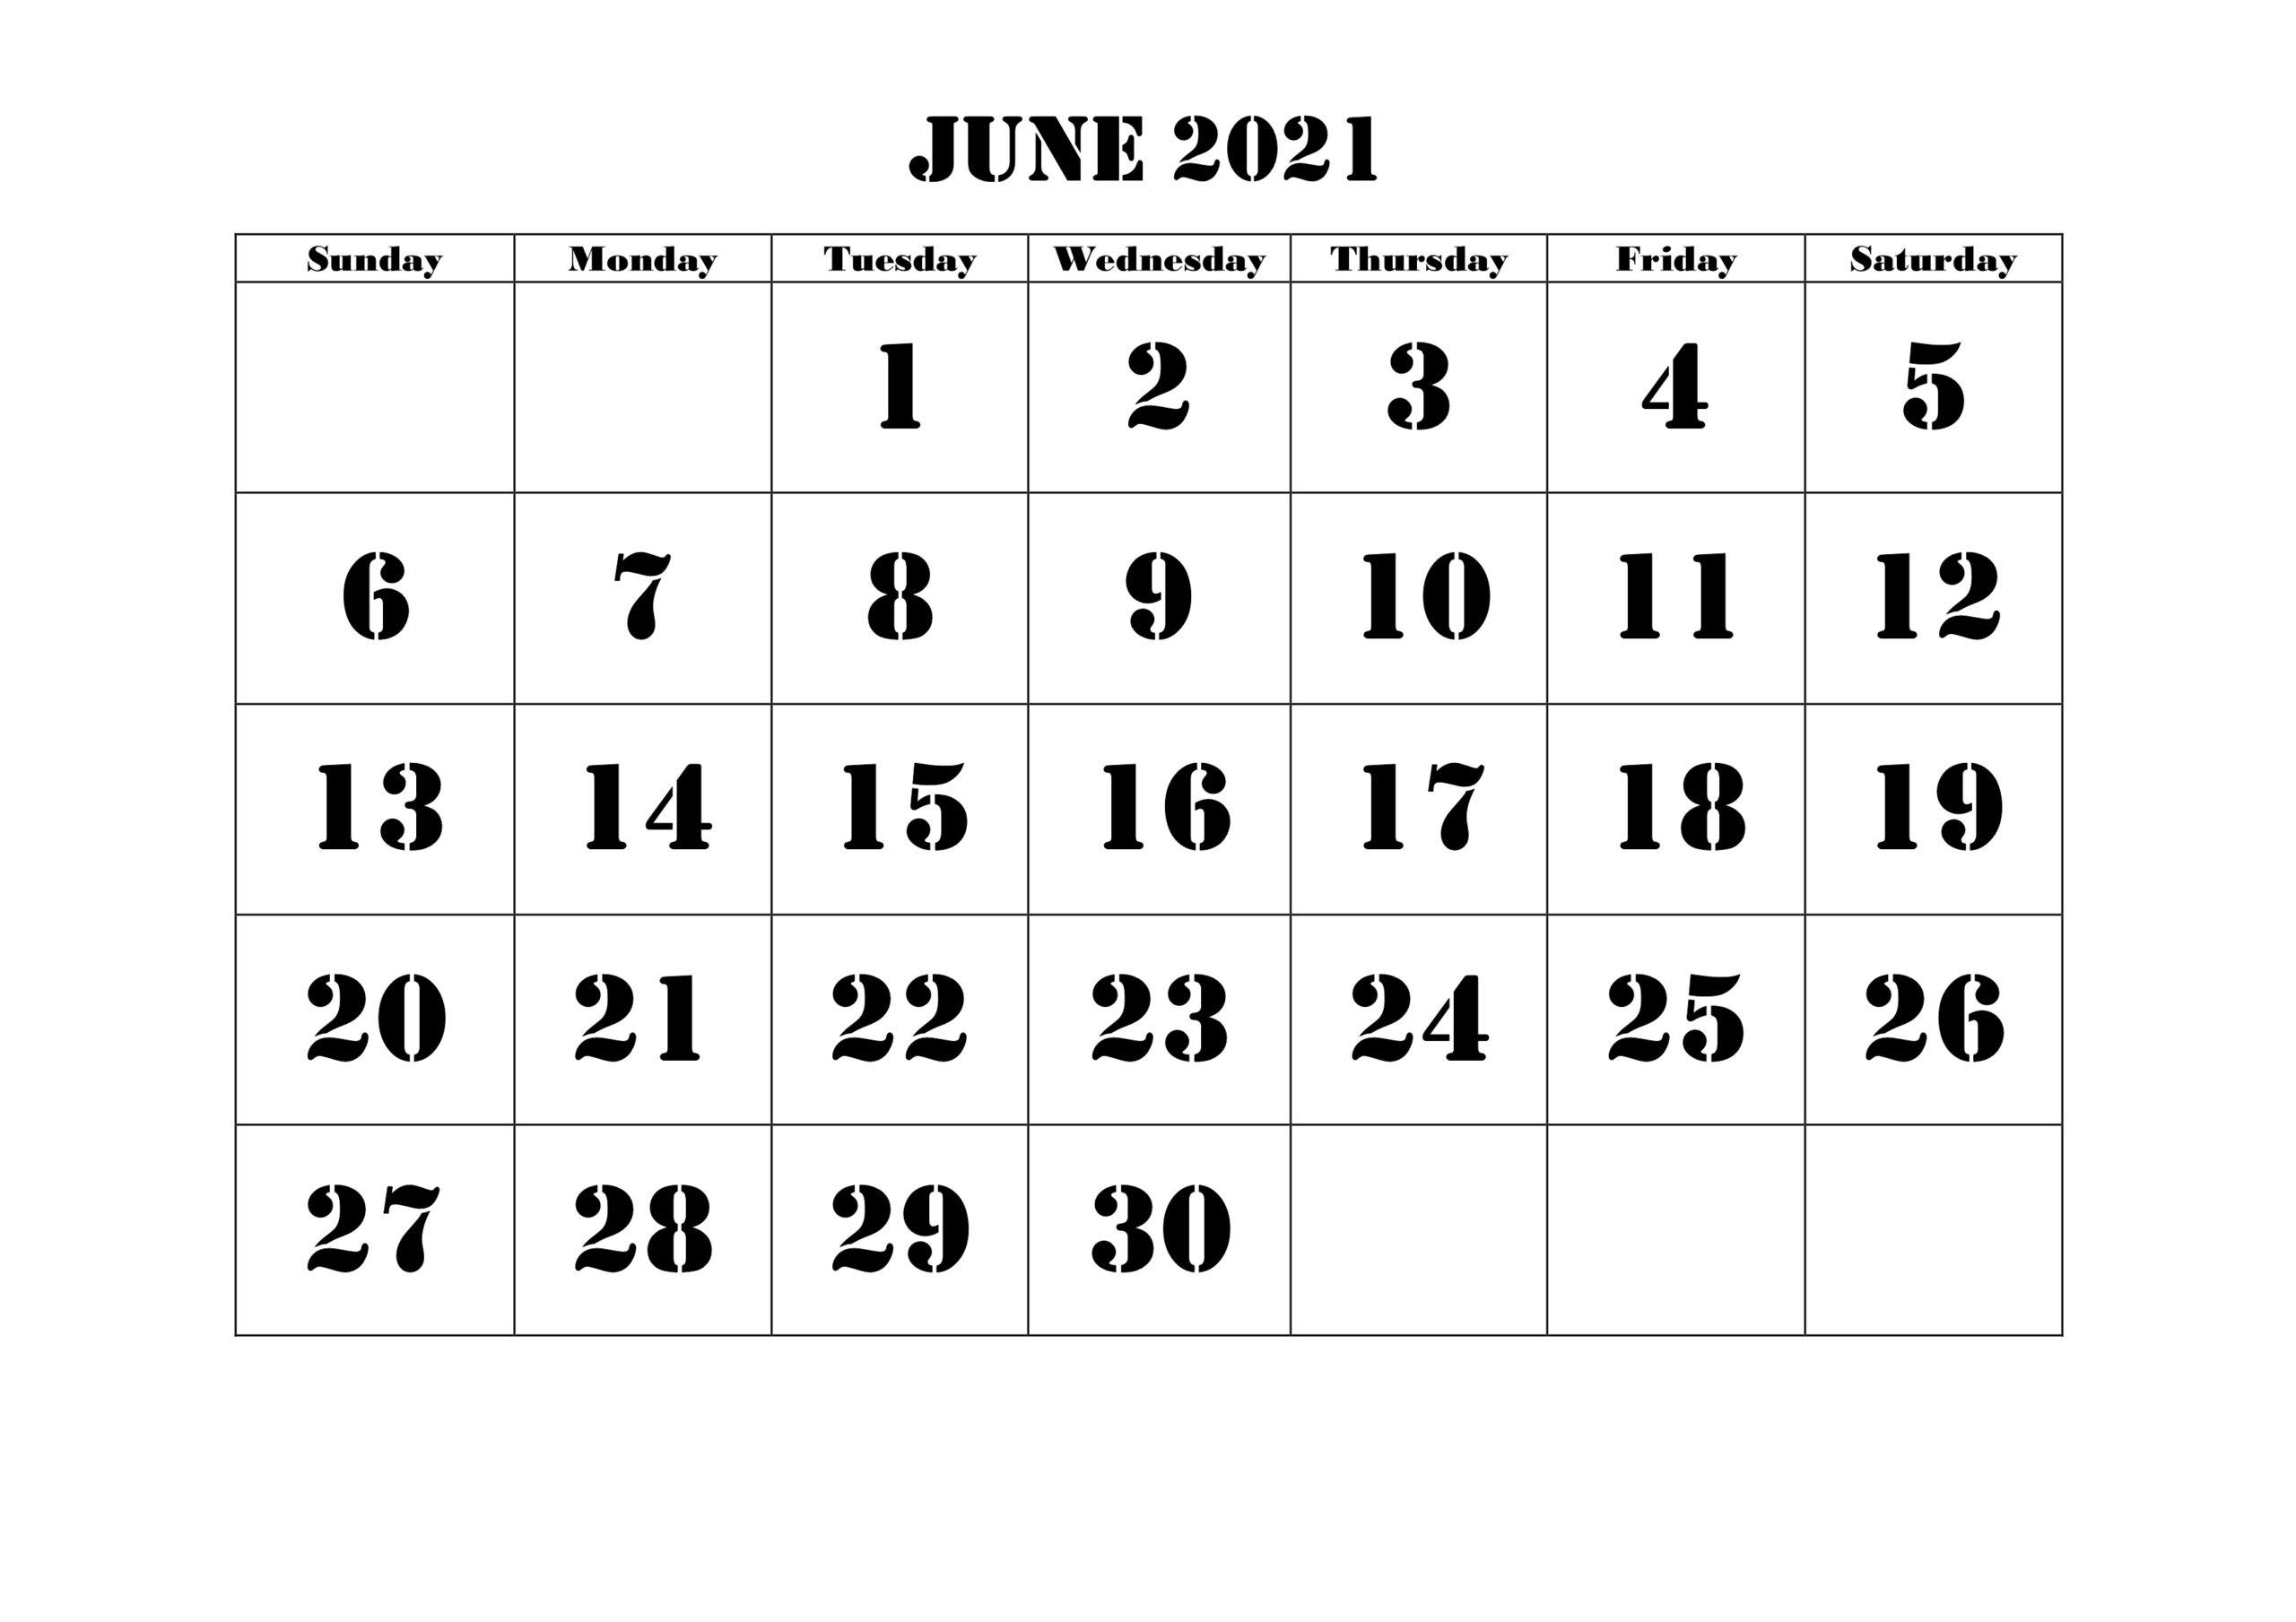 Blank June 2021 Calendar Make Schedule - Thecalendarpedia June 2021 Calendar Kuda